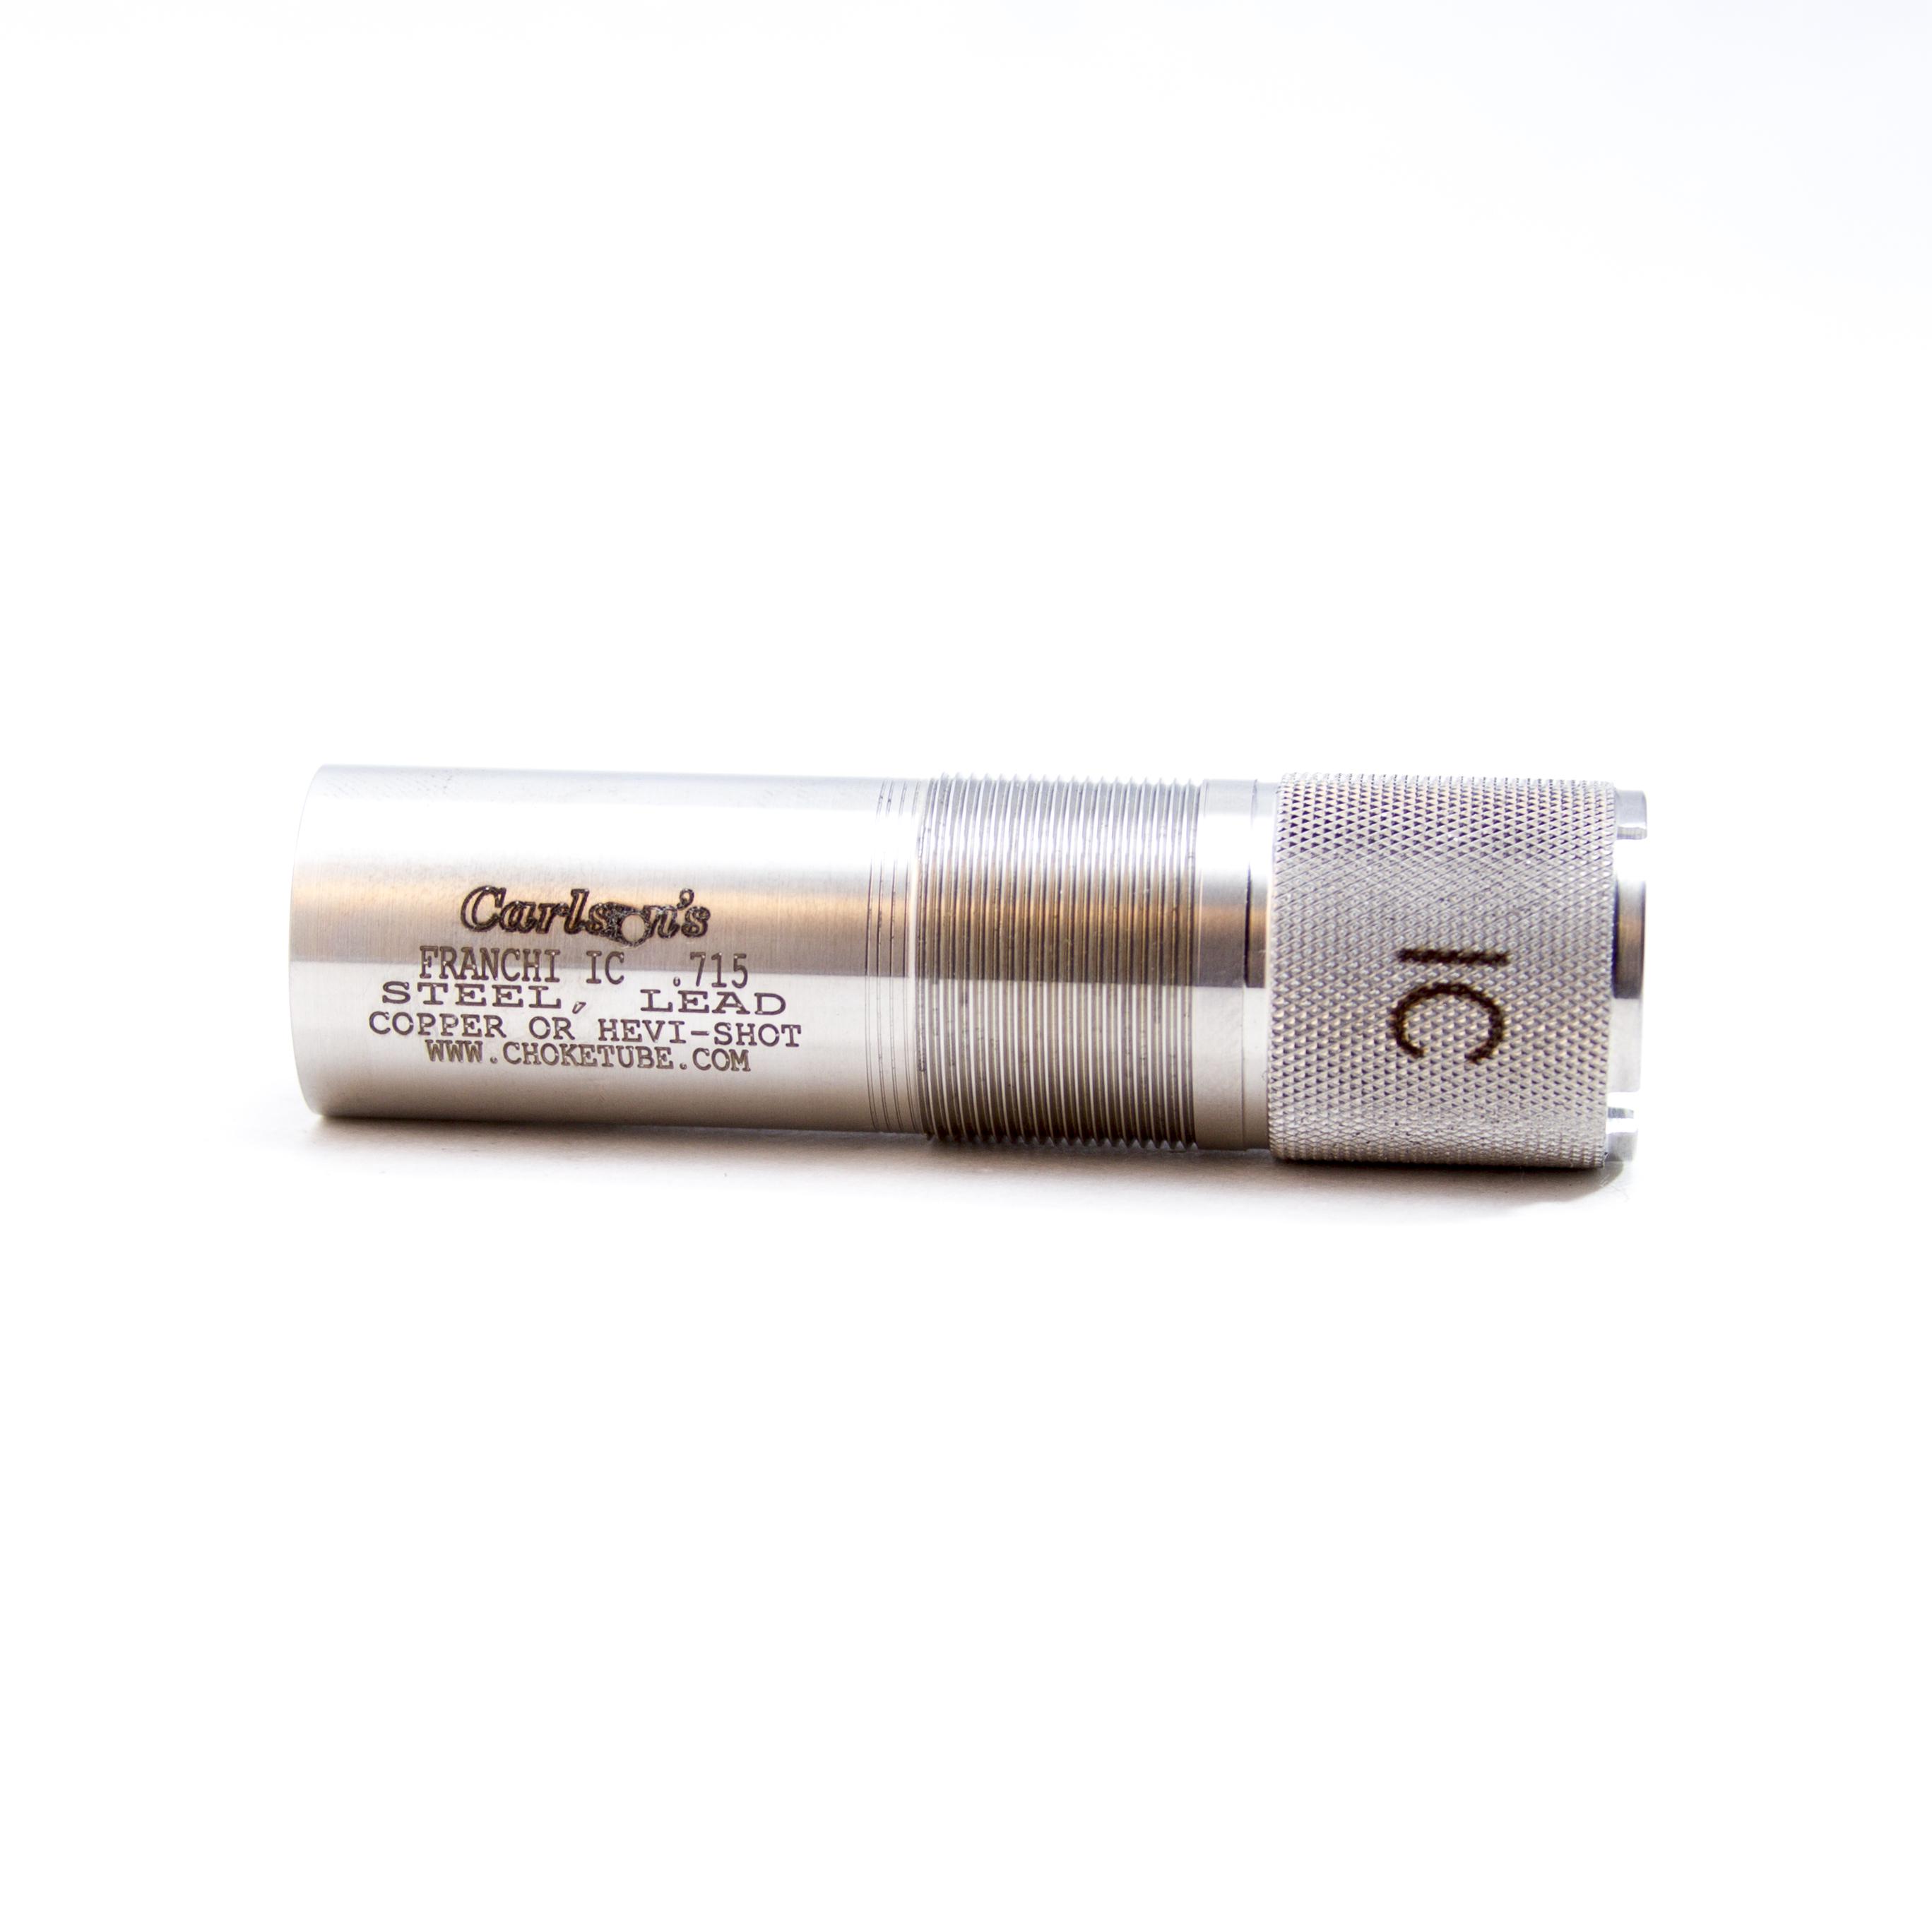 Carlson's Choke Tubes FranChoke 12ga Sporting Clay Improved Cylinder